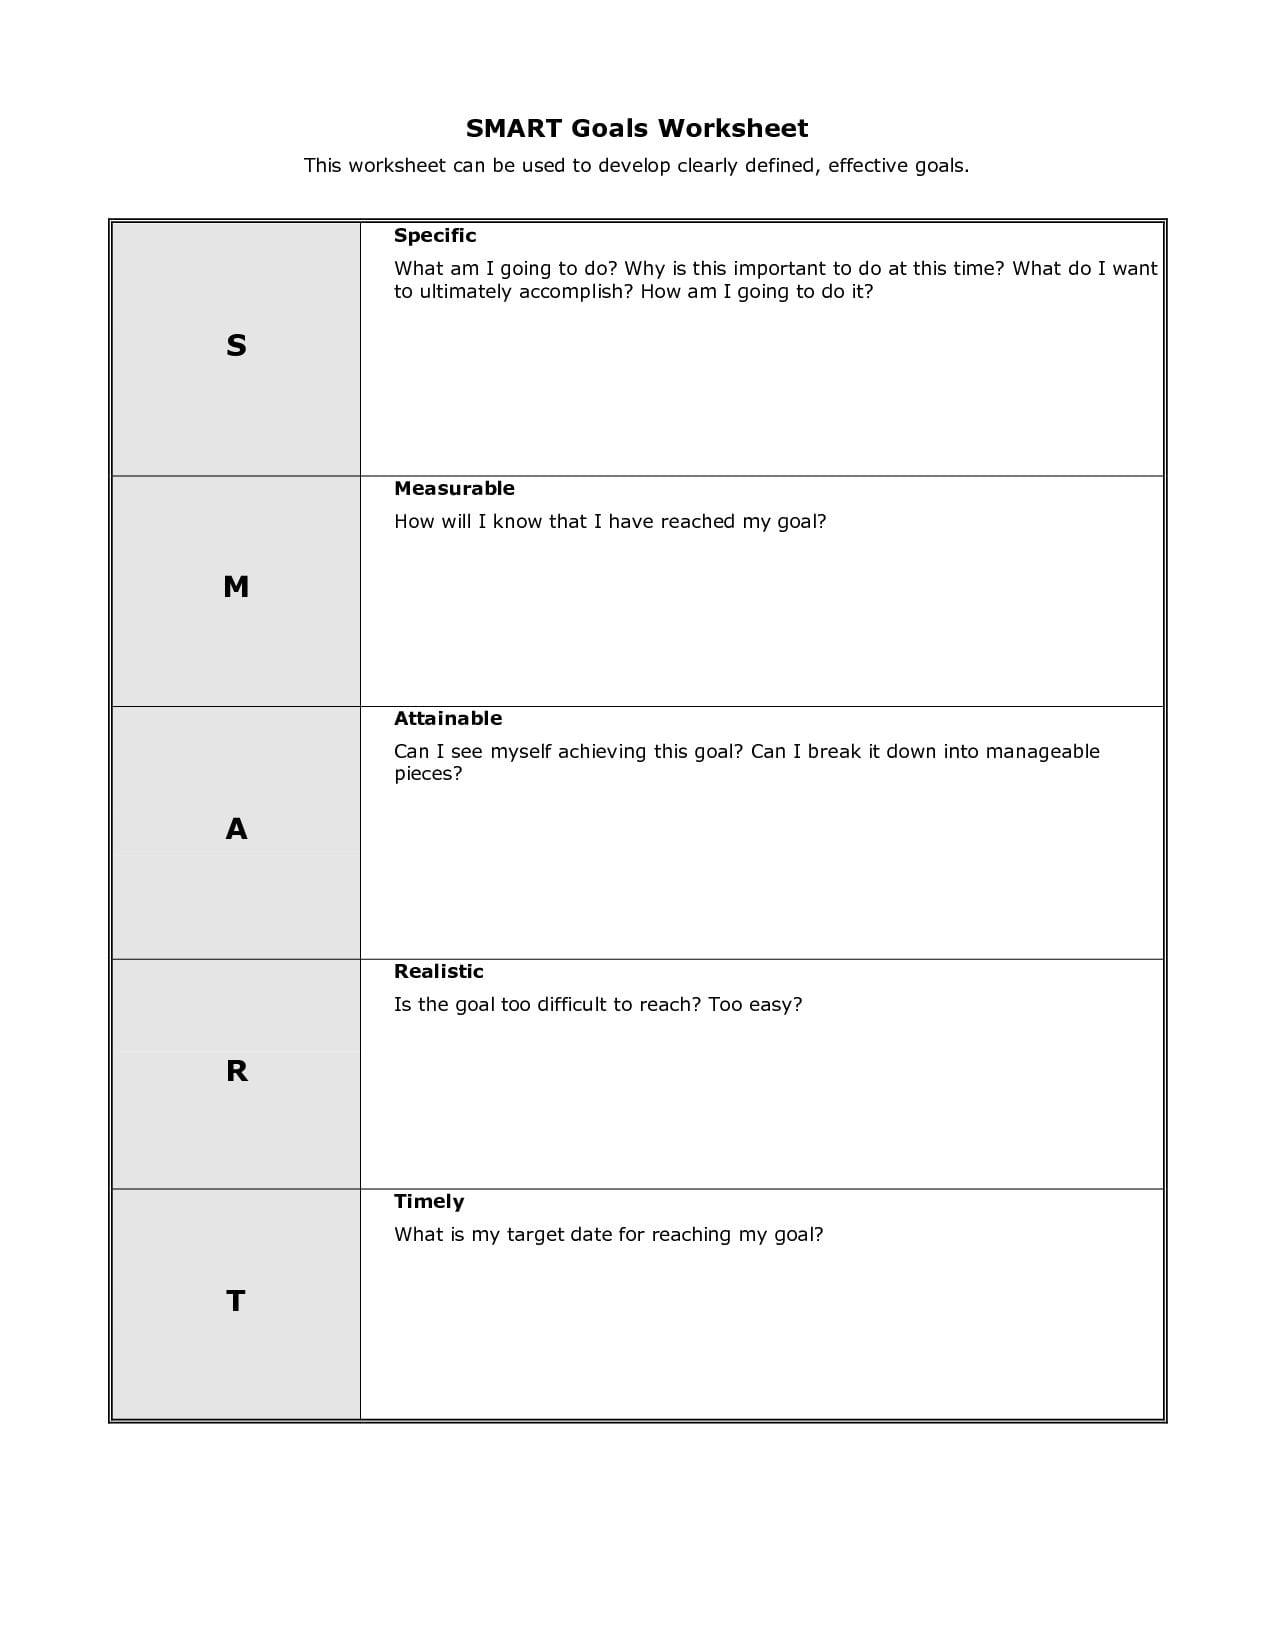 Goal Setting Worksheet For High School Students